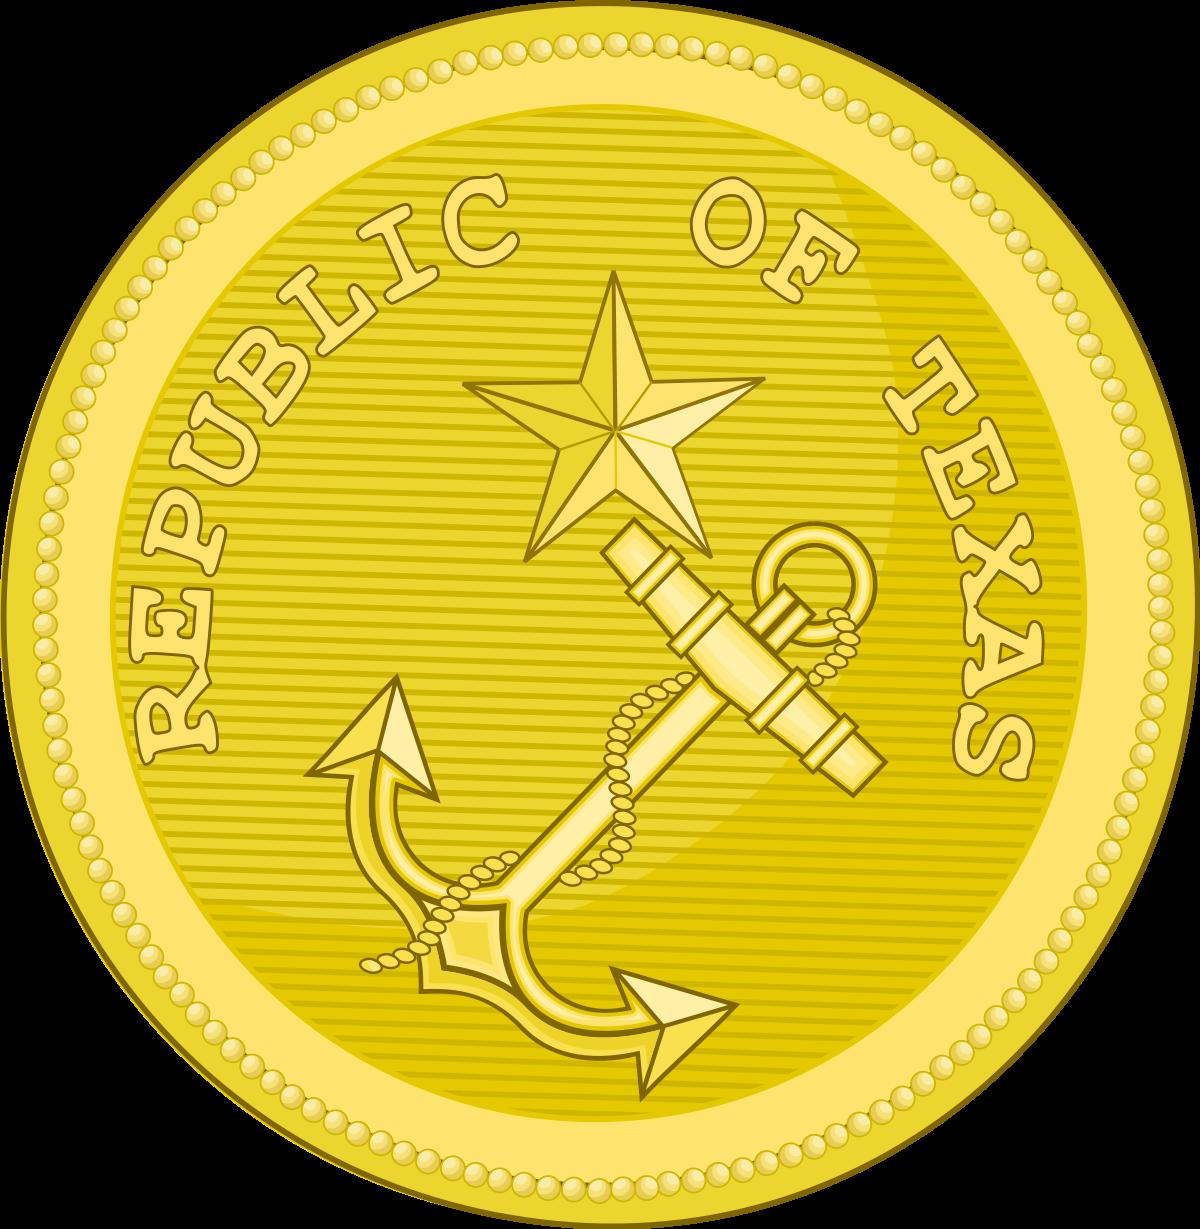 Texas wikipedia . Navy clipart seaman uniform